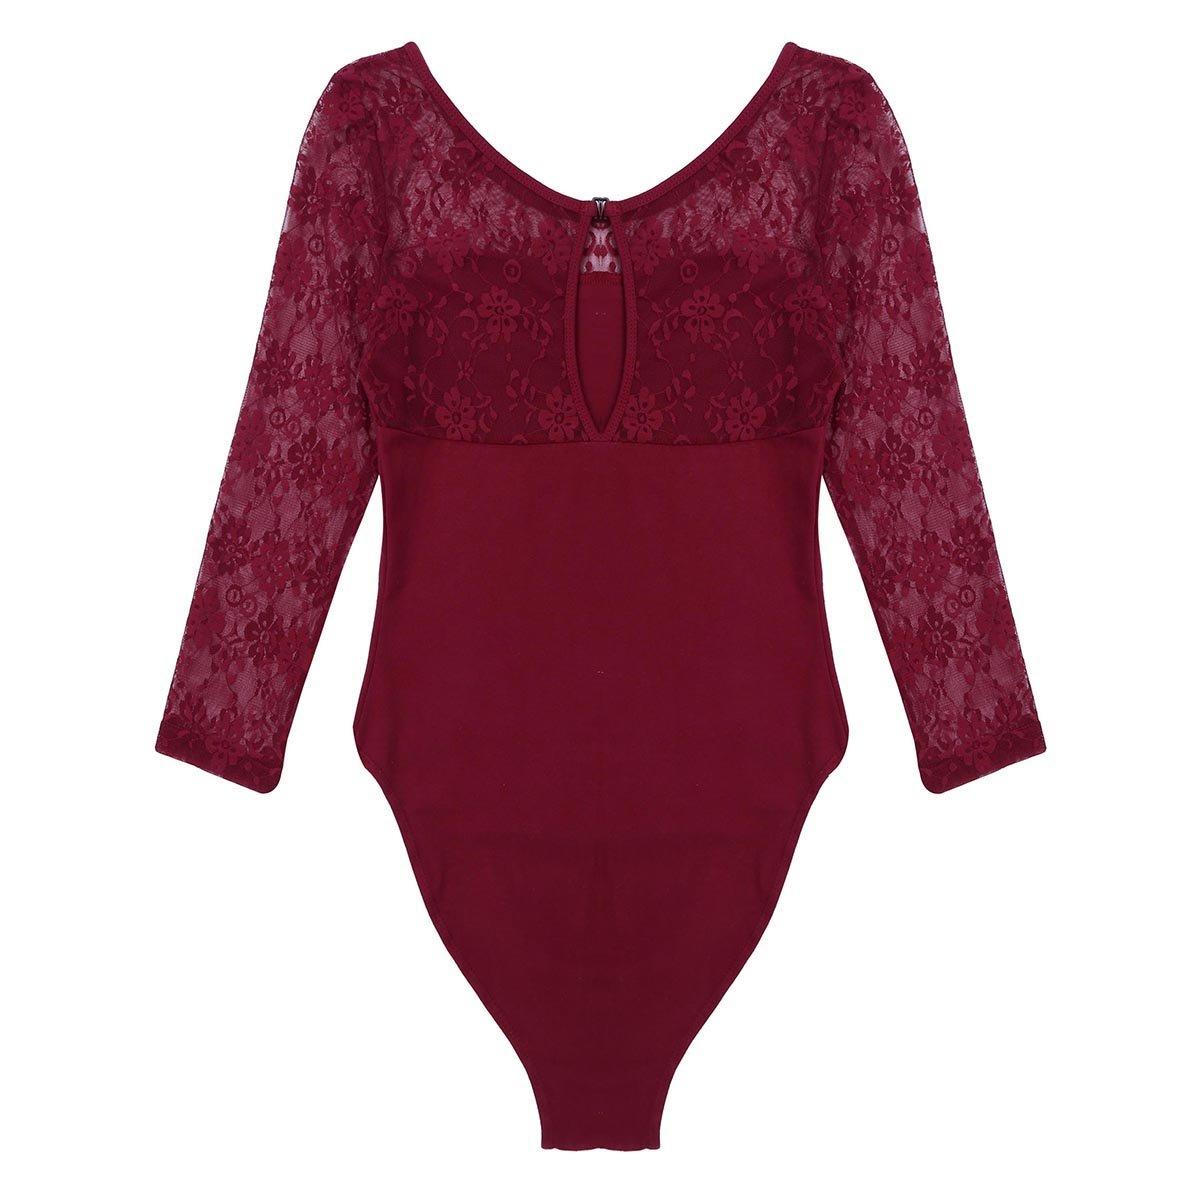 Agoky Womens Soft Lace 3//4 Sleeve Gymnastics Leotard Tops Ballet Dance Bodysuit Stretch Camisole